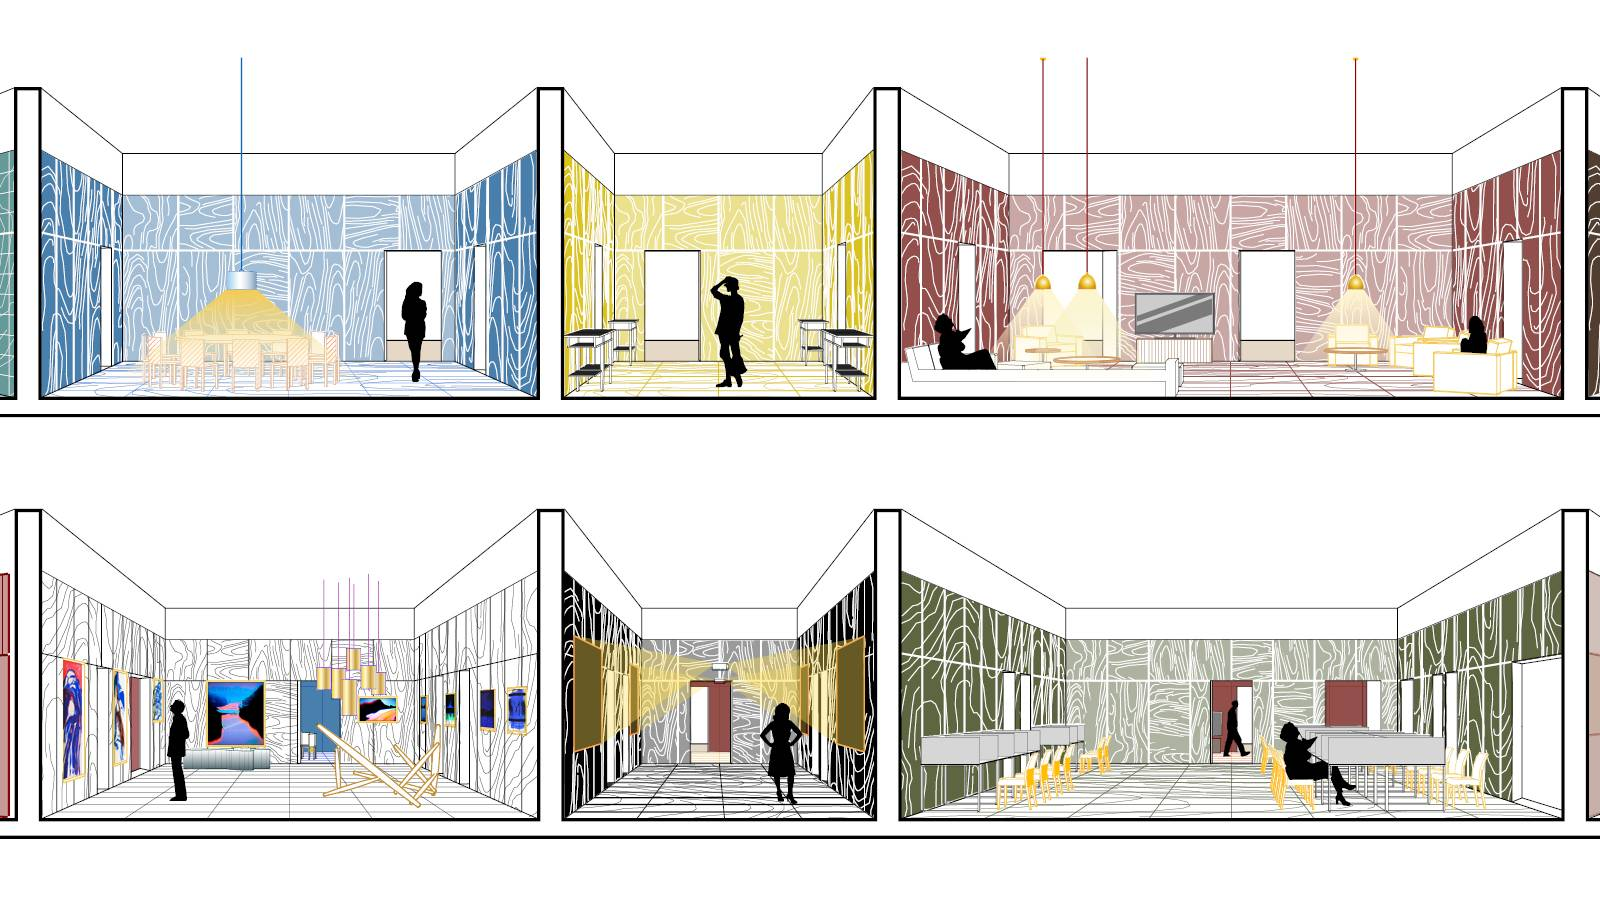 GALLERY - DINING ROOM - MEDIA GALLERY - LOBBY - LIBRARY - LIVING ROOM - Frankfurt Book Fair Pavilion - SPOL Architects